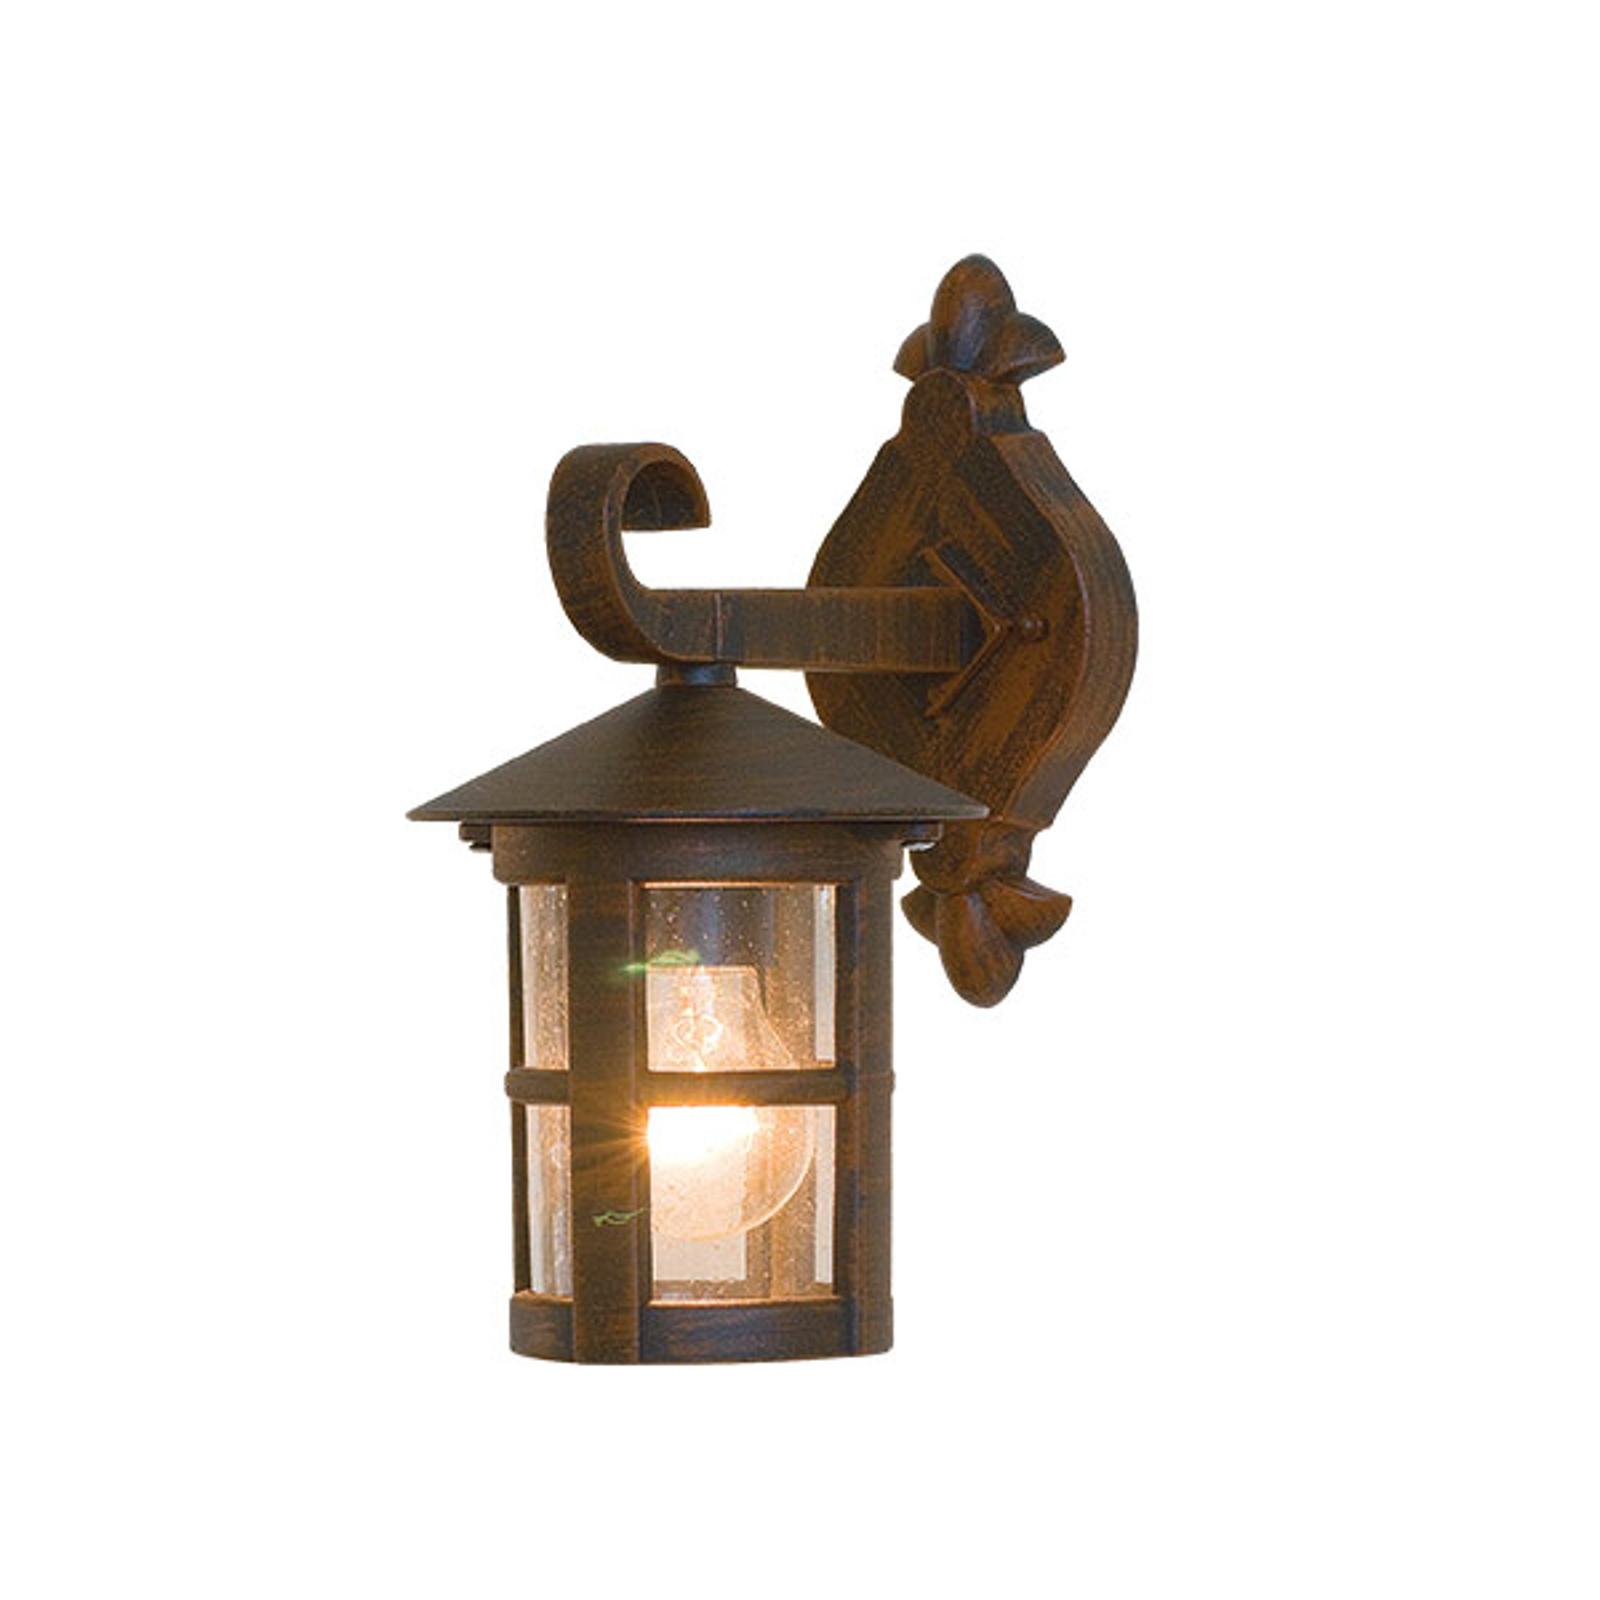 Buitenwandlamp Skiathos IP54 bruin Ø 15,5 cm